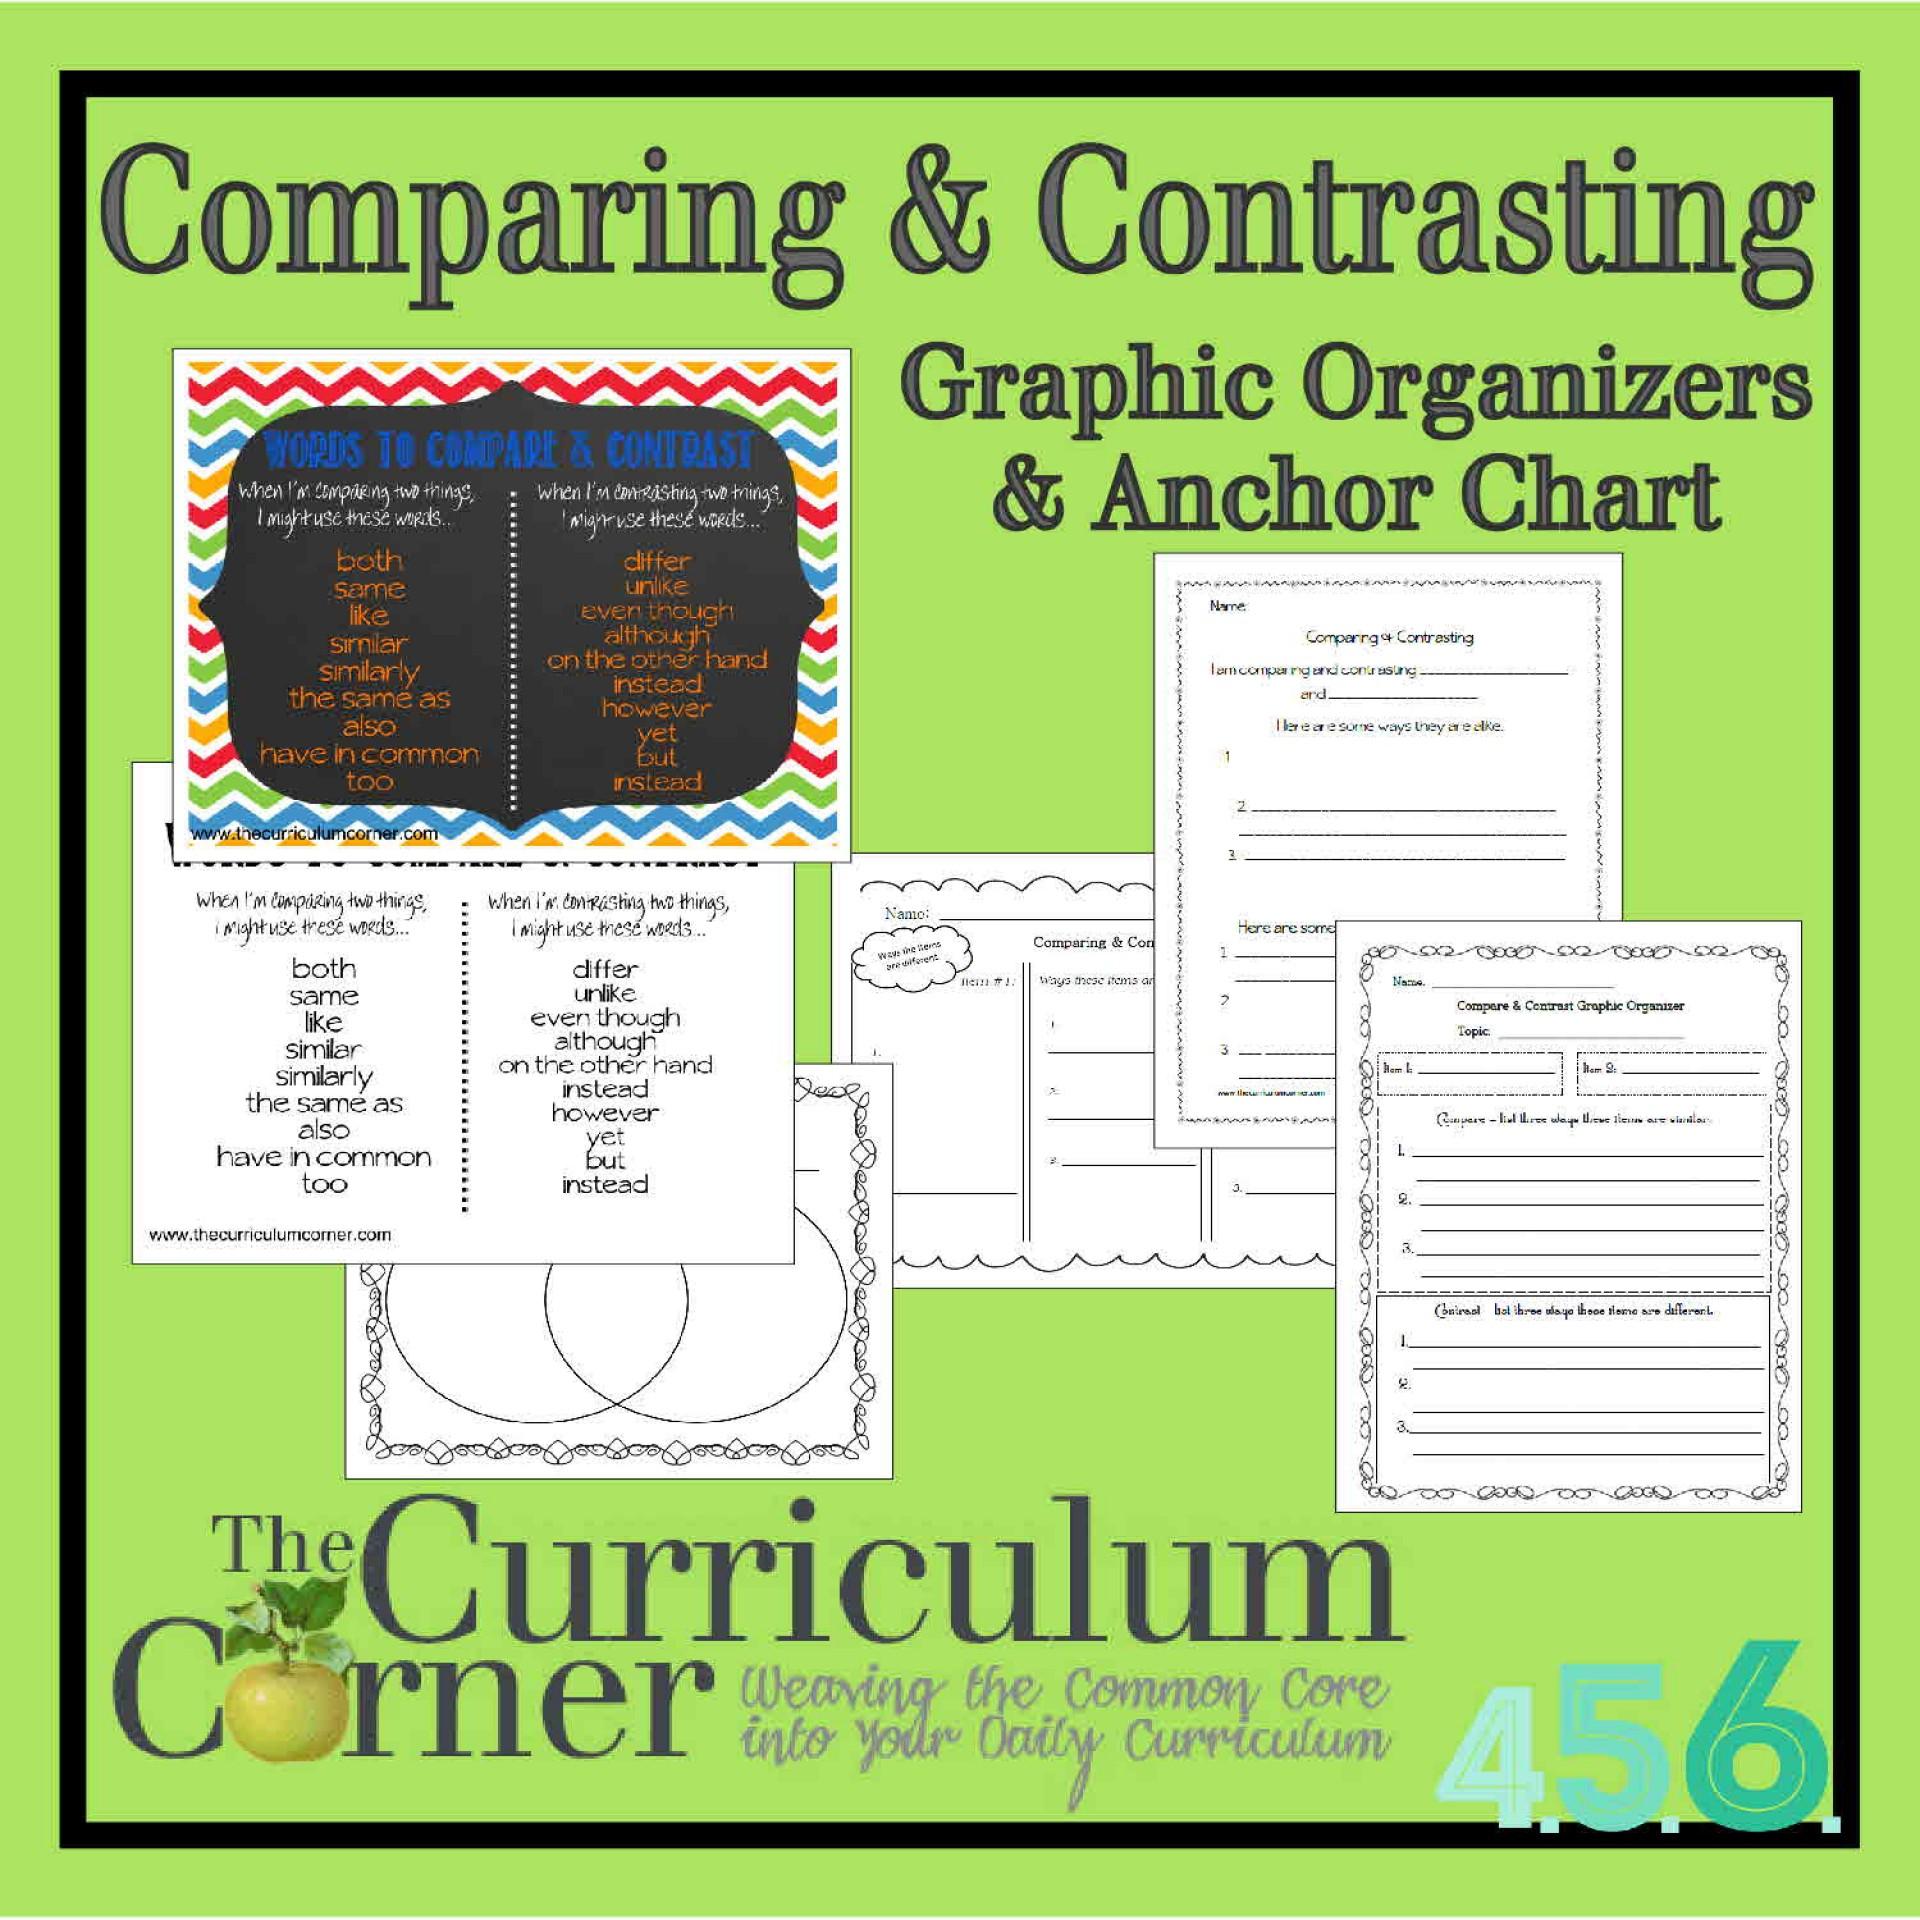 010 Comparecontrasticon456 Essay Example Compare And Contrast Graphic Wondrous Organizer Middle School 1920